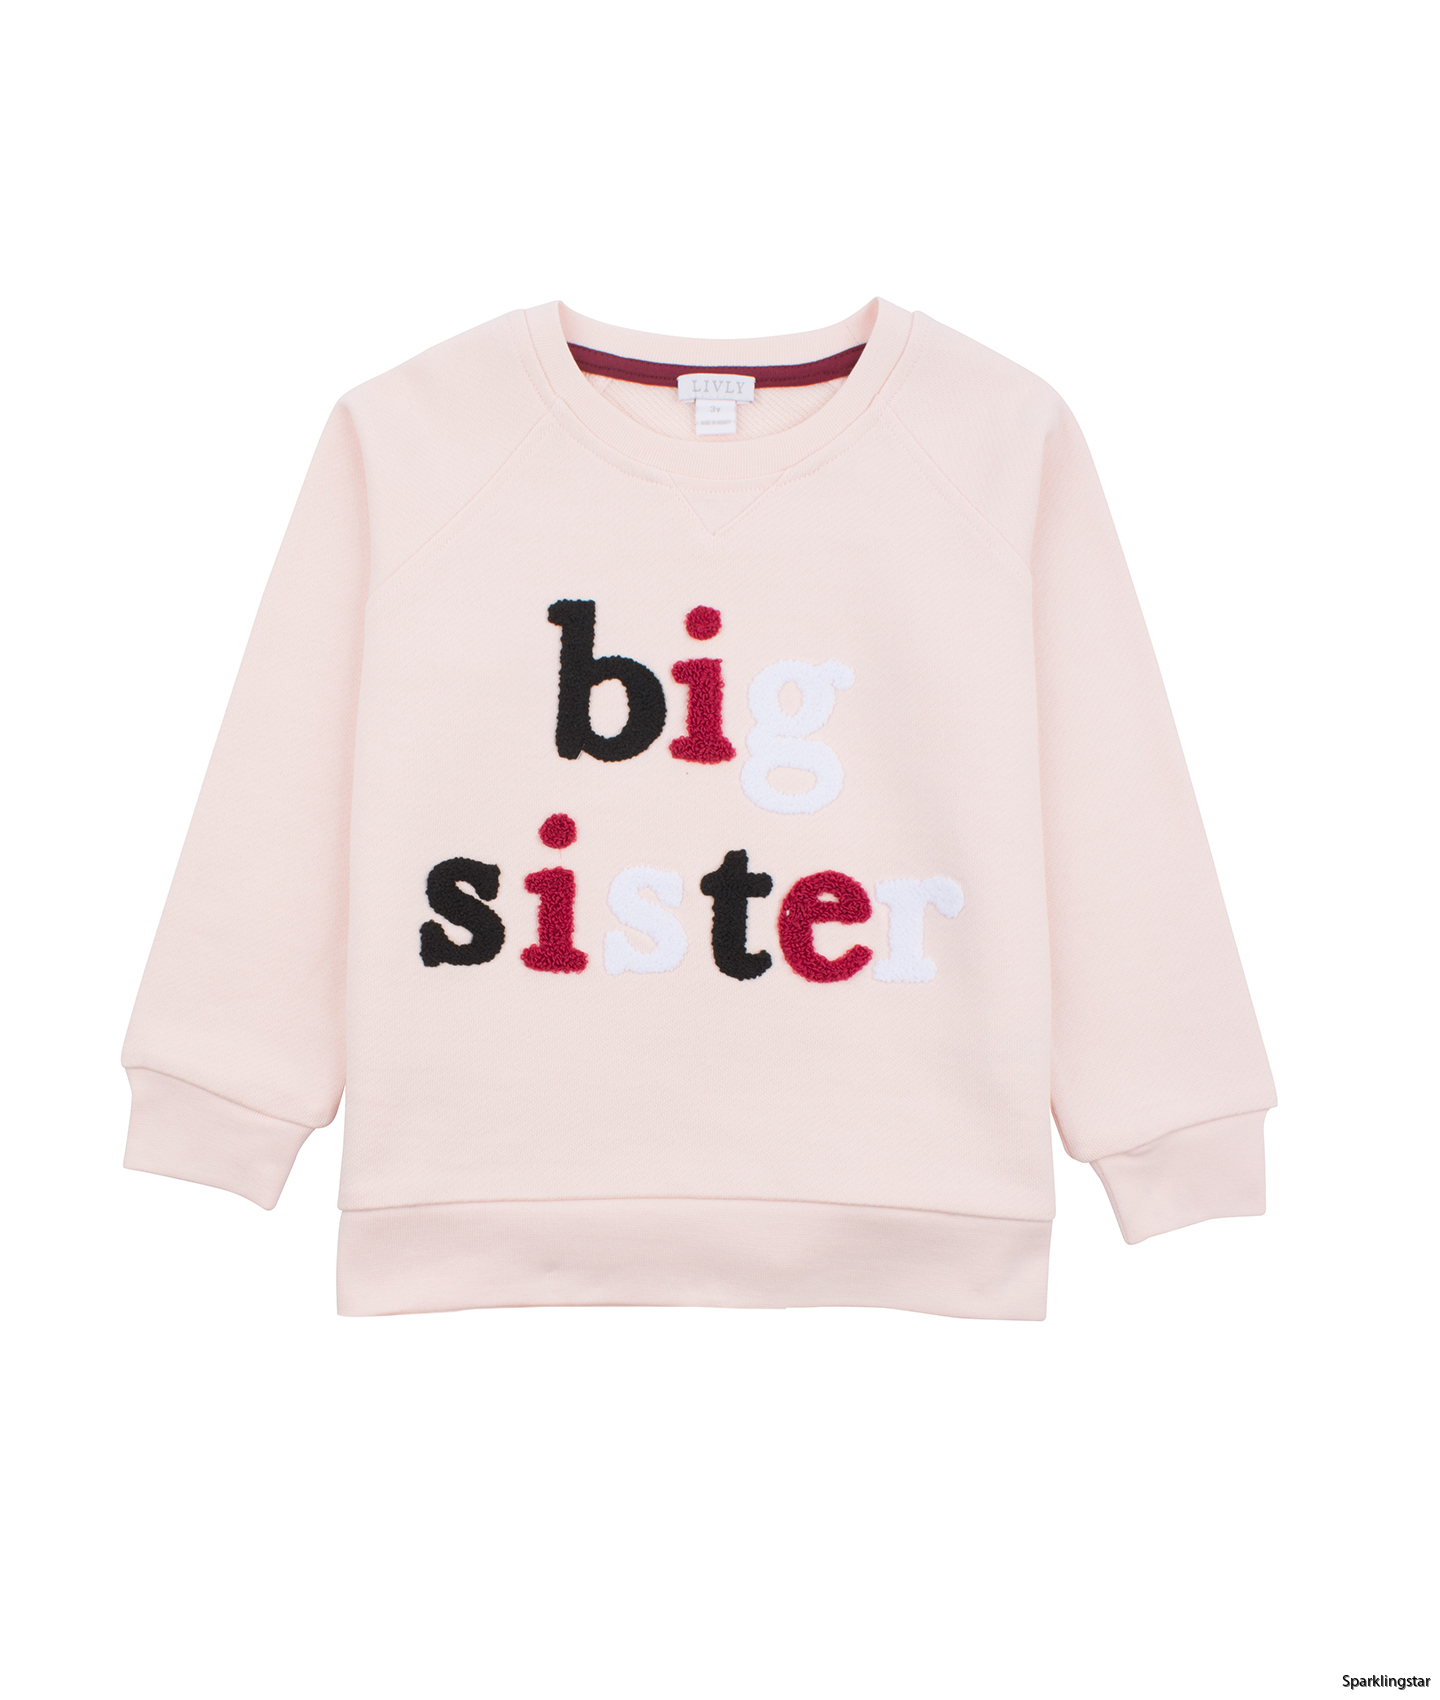 Livly Big Sister Sweatshirt